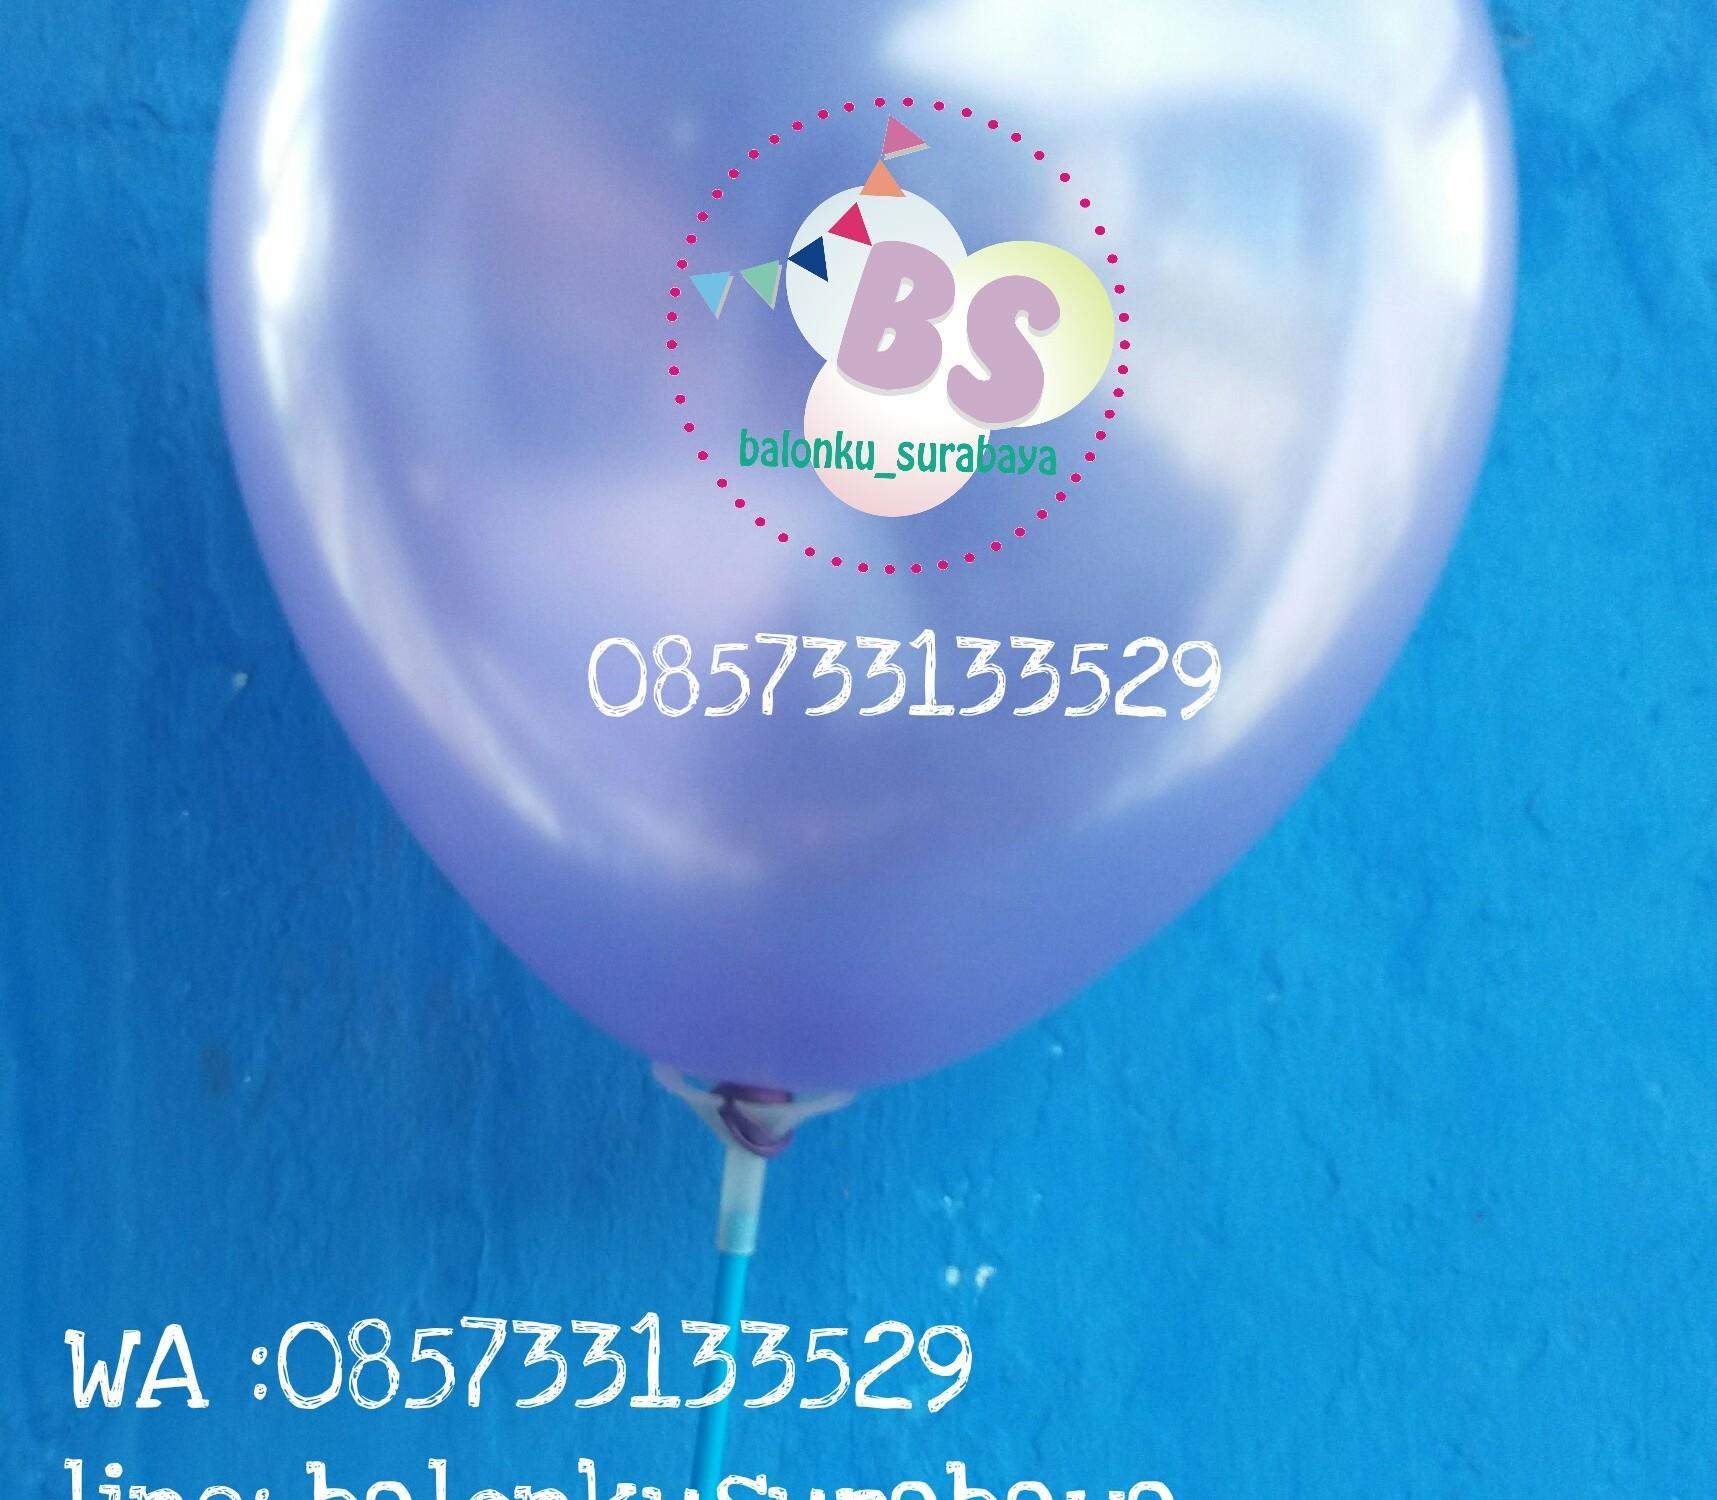 balon metalik ungu muda, balon doff, balon latex doff, balon ulang tahun, balon dekorasi, balon foil, balon metalik, balon twist, balon latex, balon huruf, balon angka, supplier balon, dekorasi balon, sablon balon, confetti, bendera ulang tahun, balon LED, lampion terbang